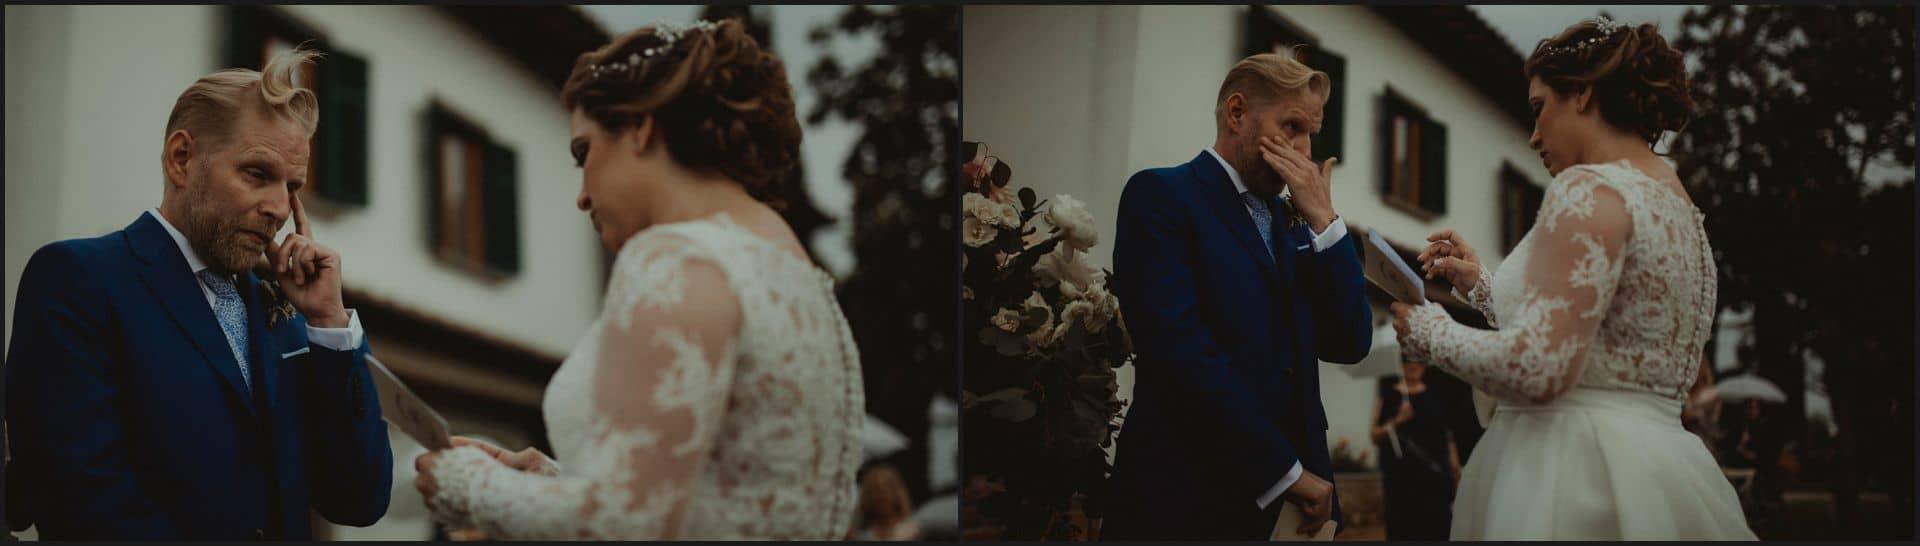 tuscany, destination wedding, chianti, wedding ceremony, vows, bride, groom